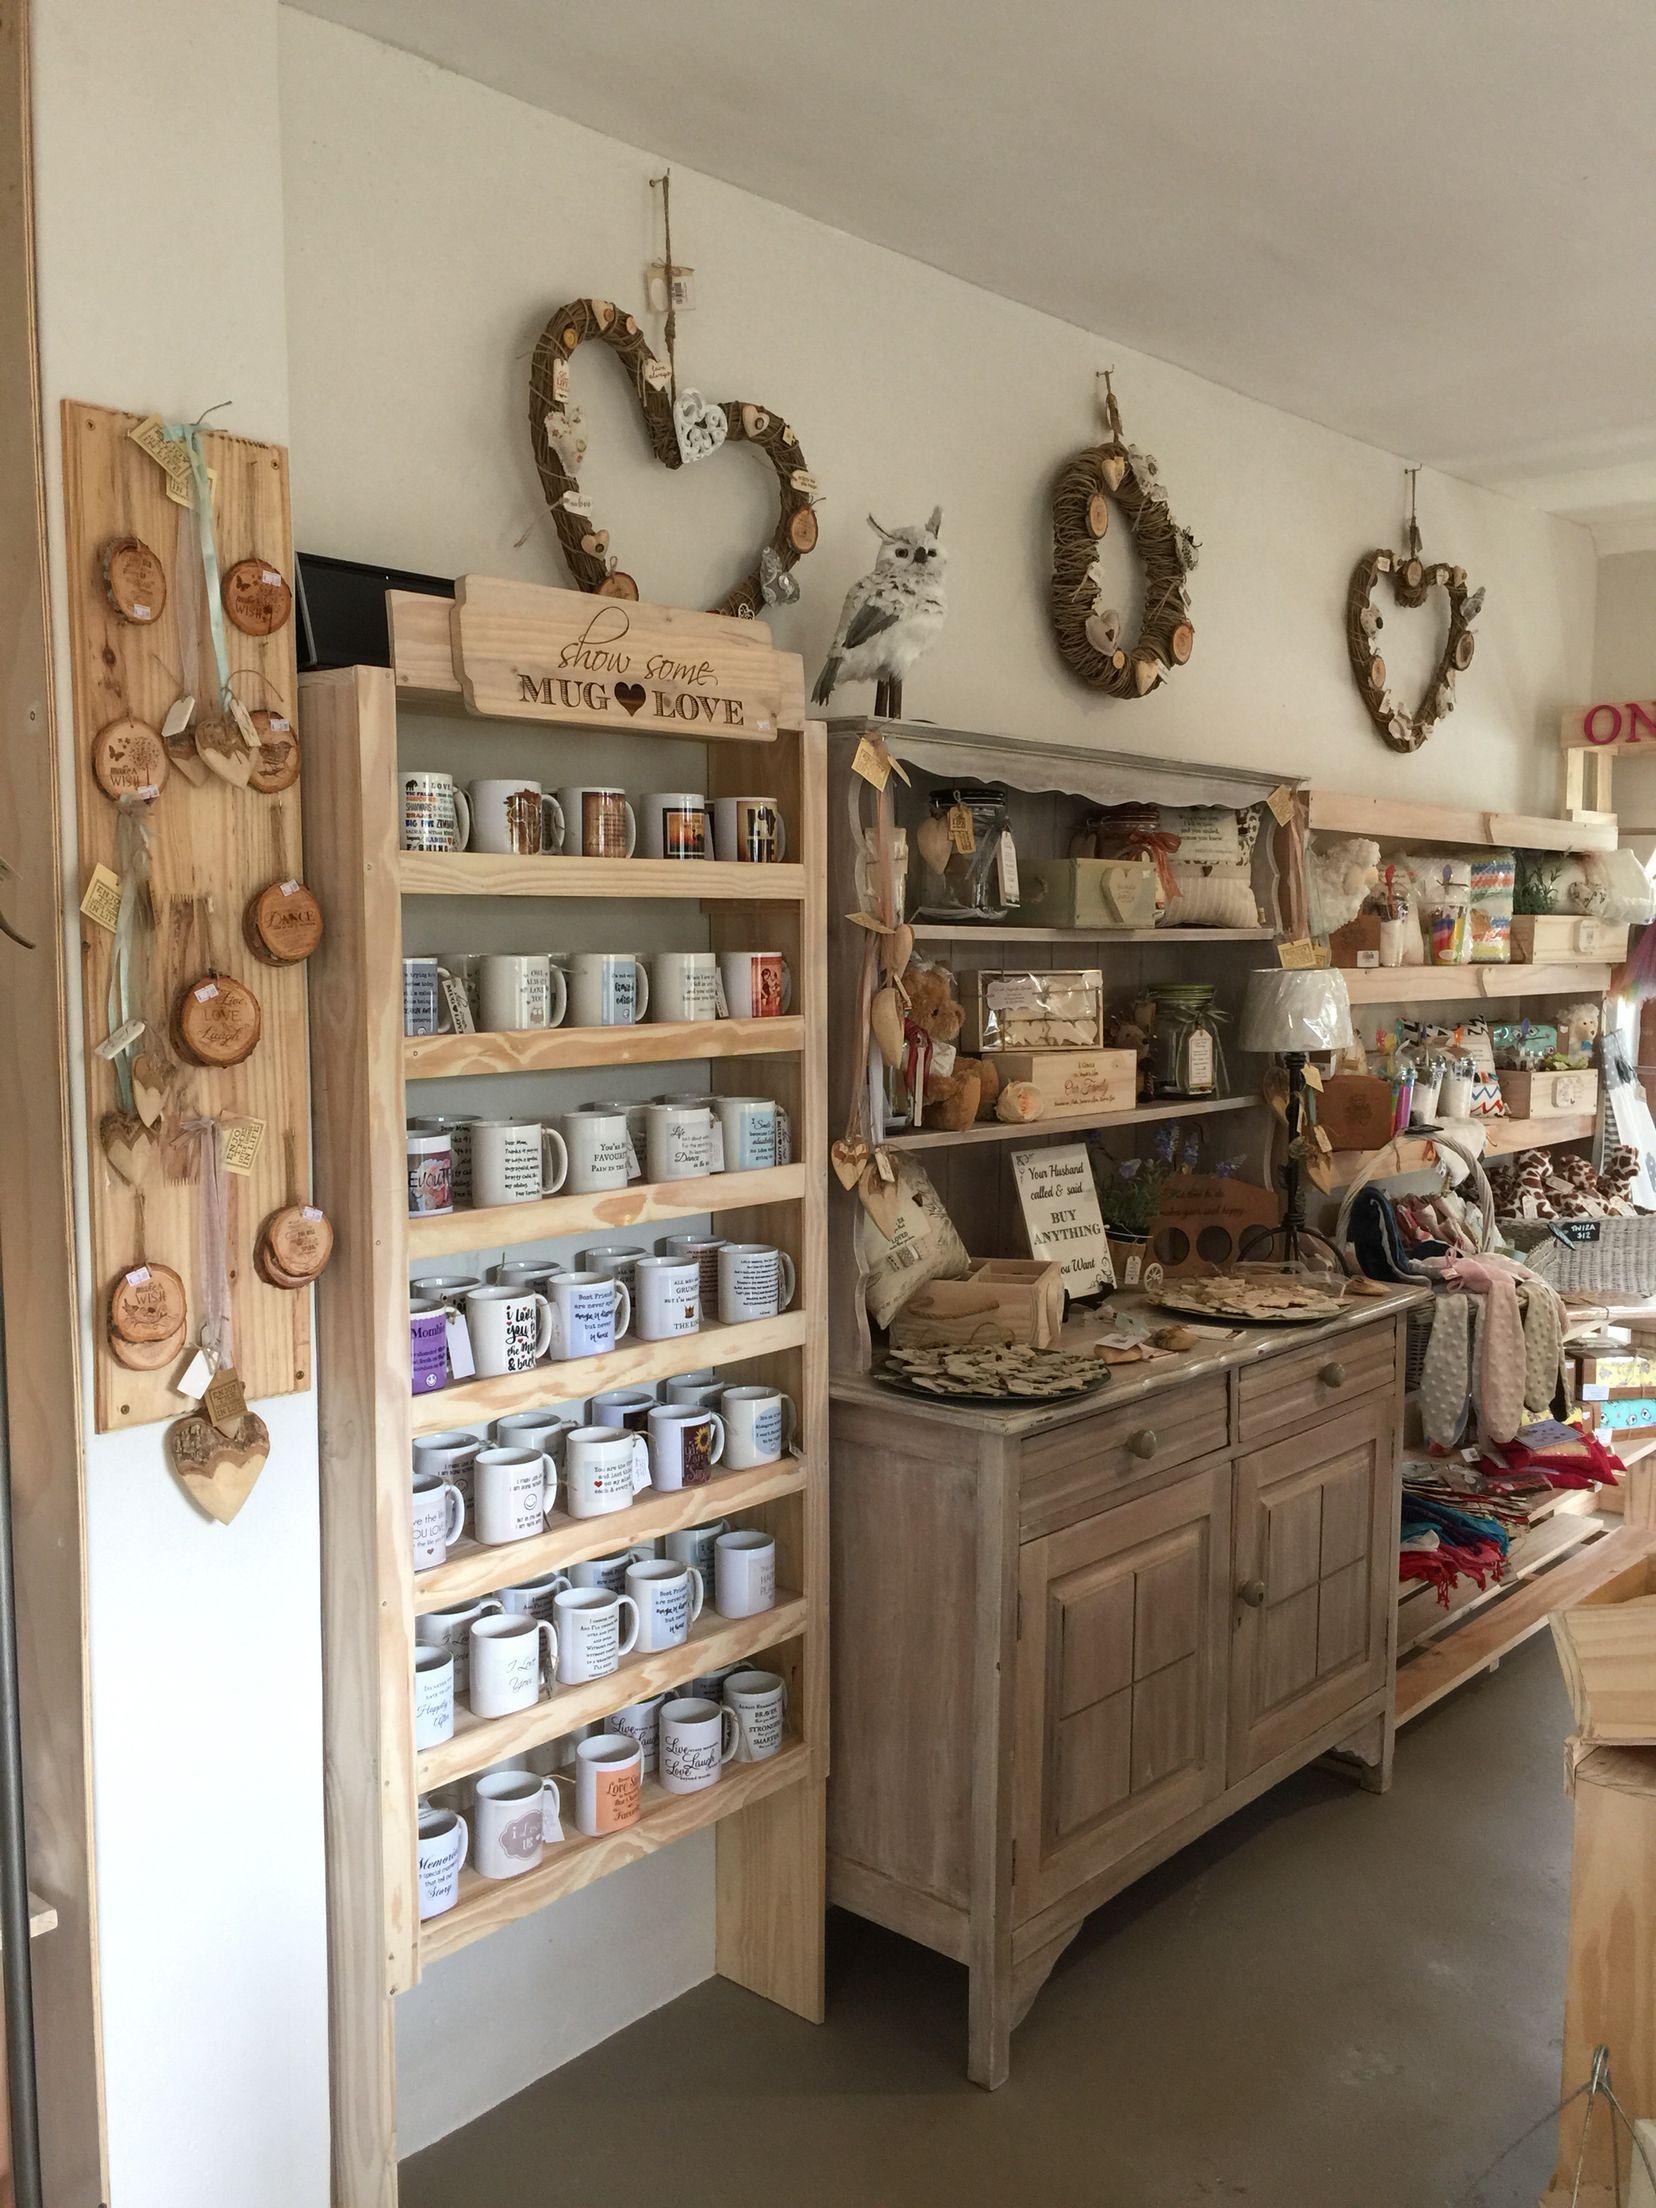 Furniture shops in harare - Crafty Bugs Shop No 1 Hurworth Road Highlands Harare Zimbabwe